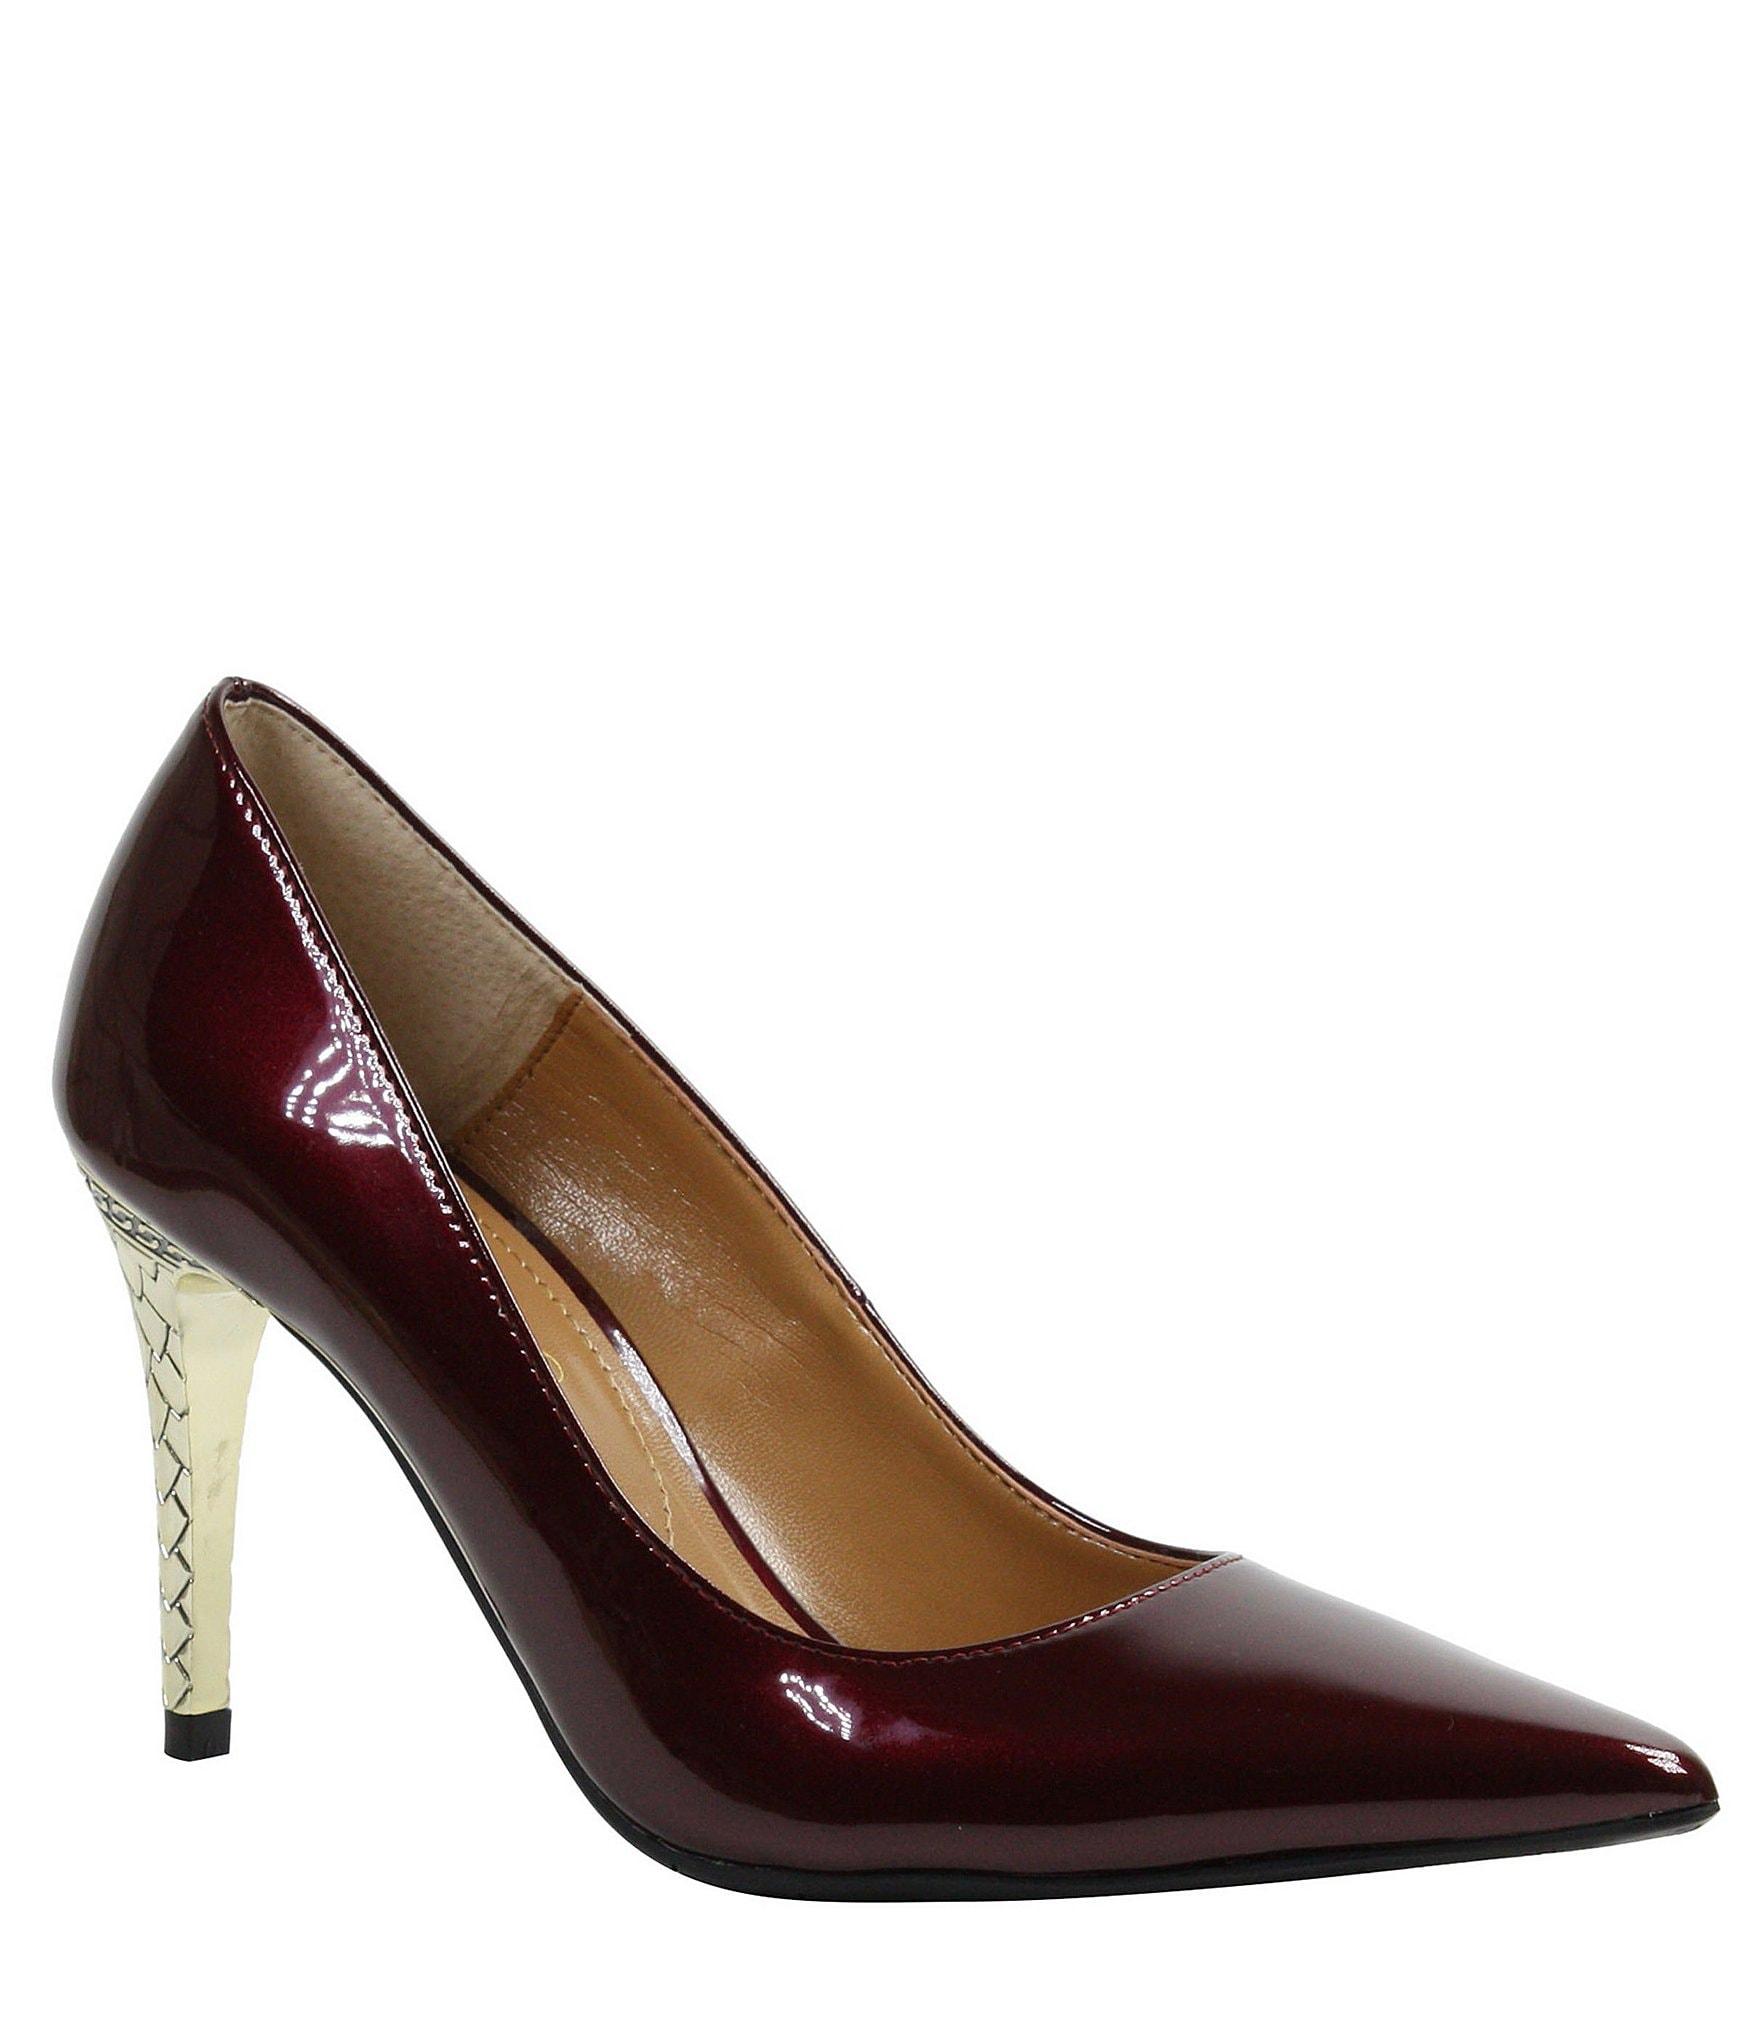 dbb363081ec shoe clearance  Women s Shoes